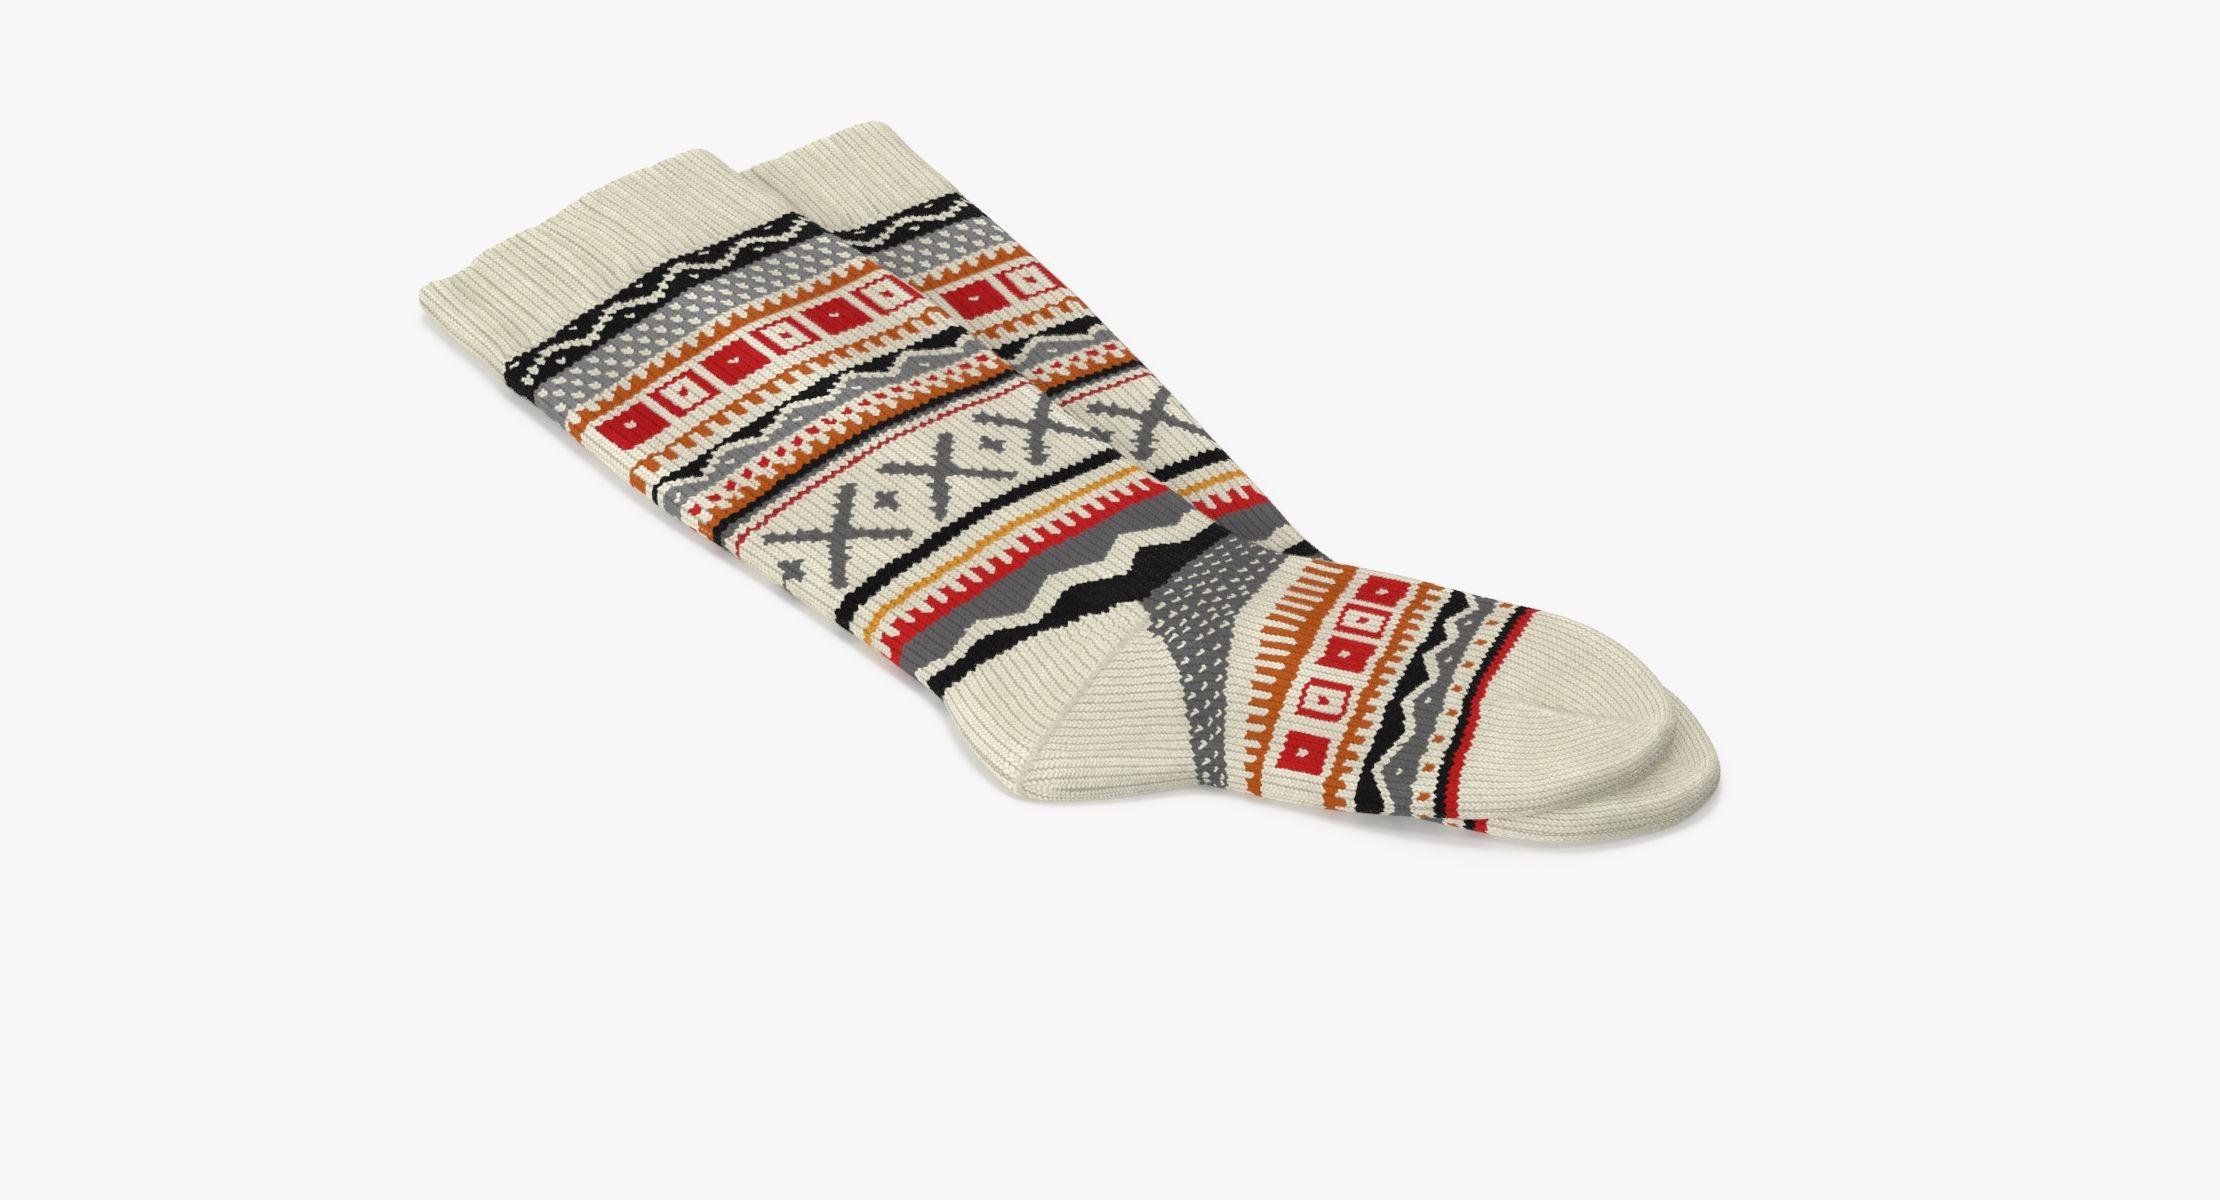 Winter Socks - reel 1